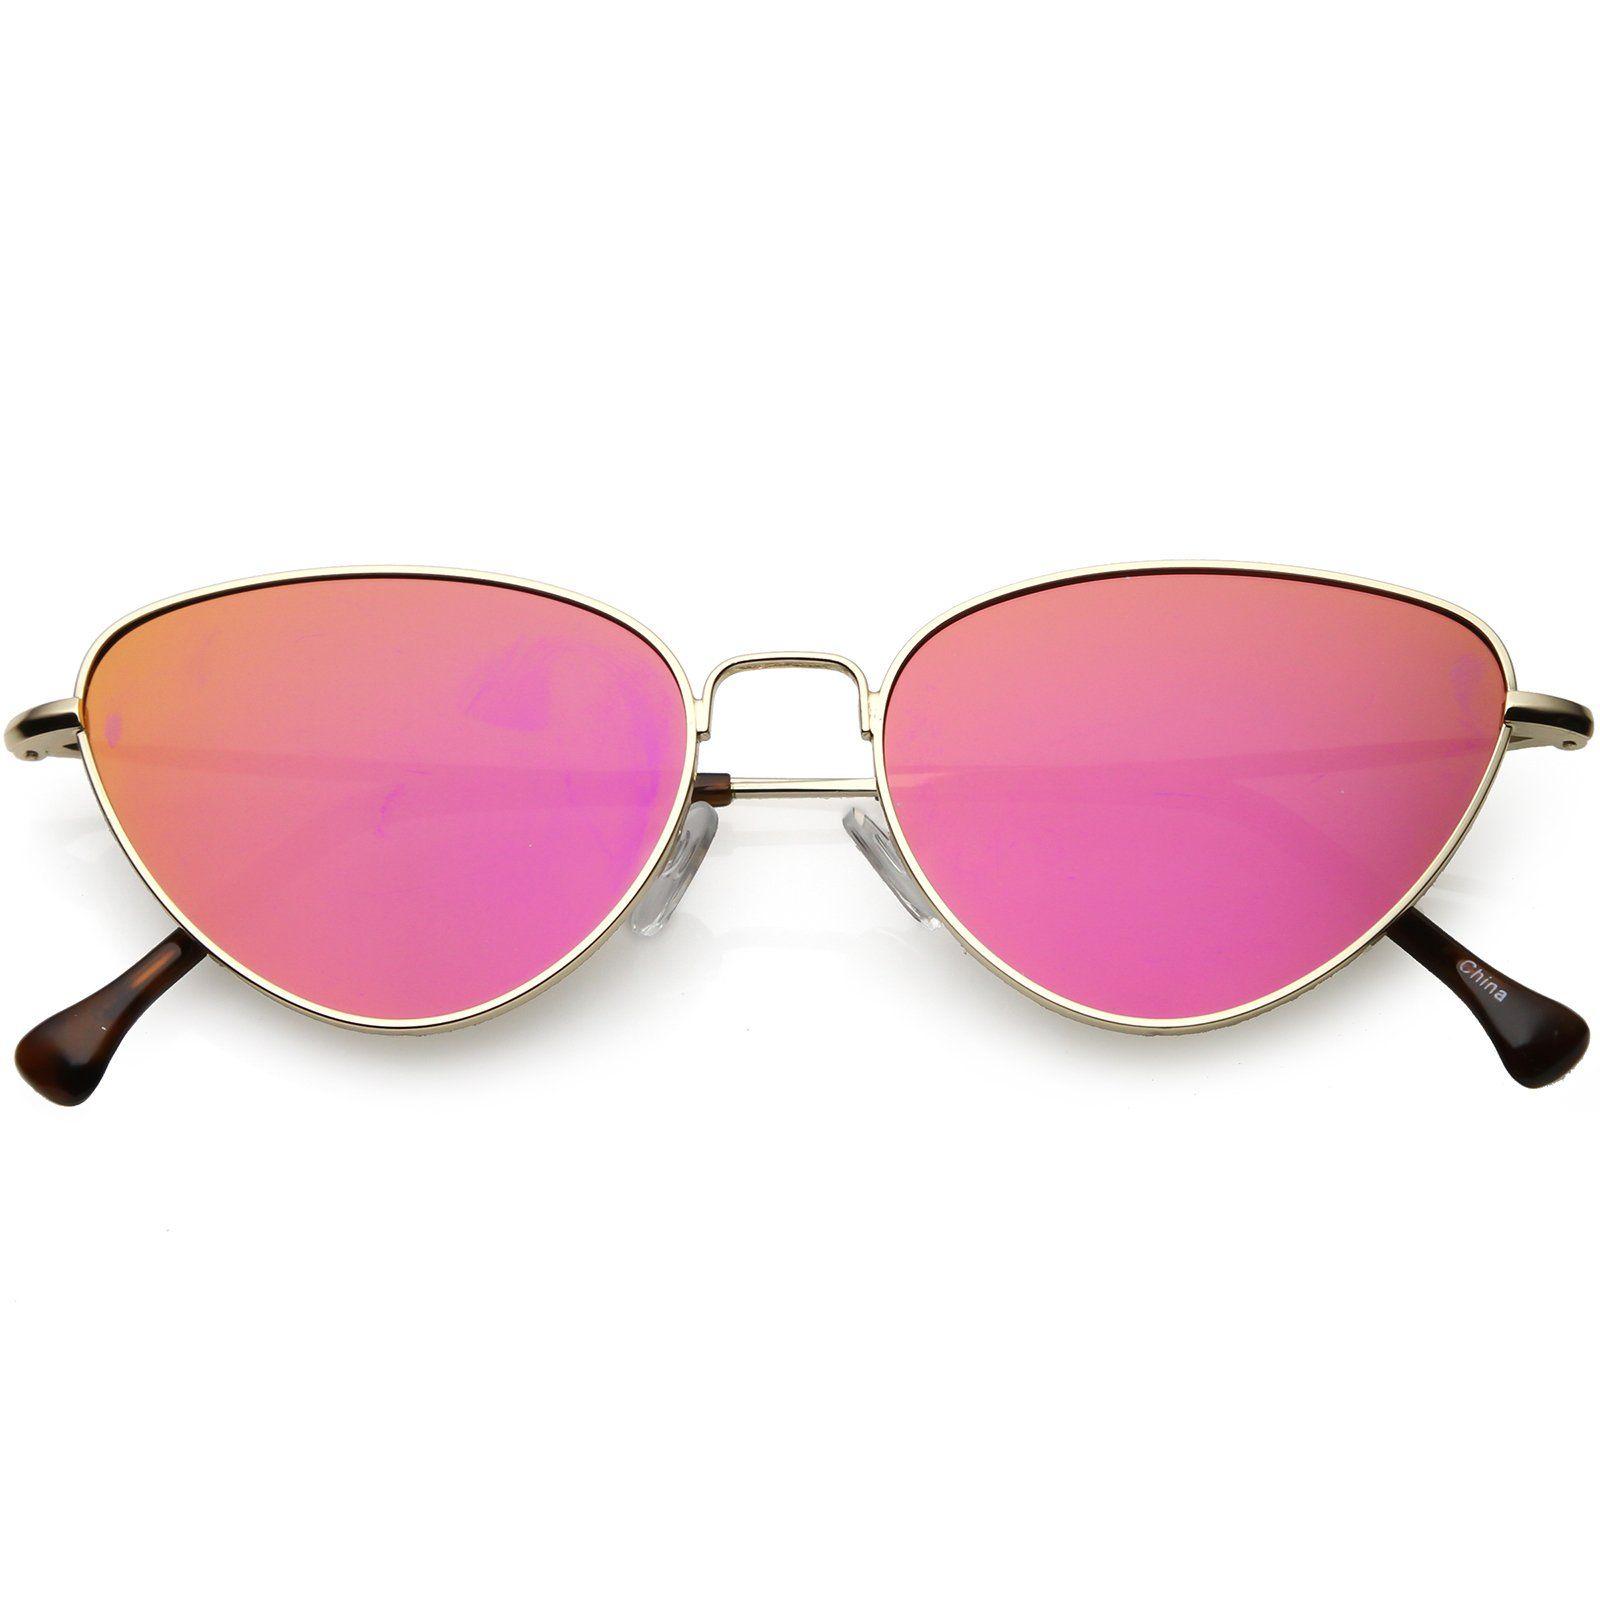 3d7ddde44b8 Women s Slim Metal Cat Eye Sunglasses Colored Mirror Flat Lens 54mm